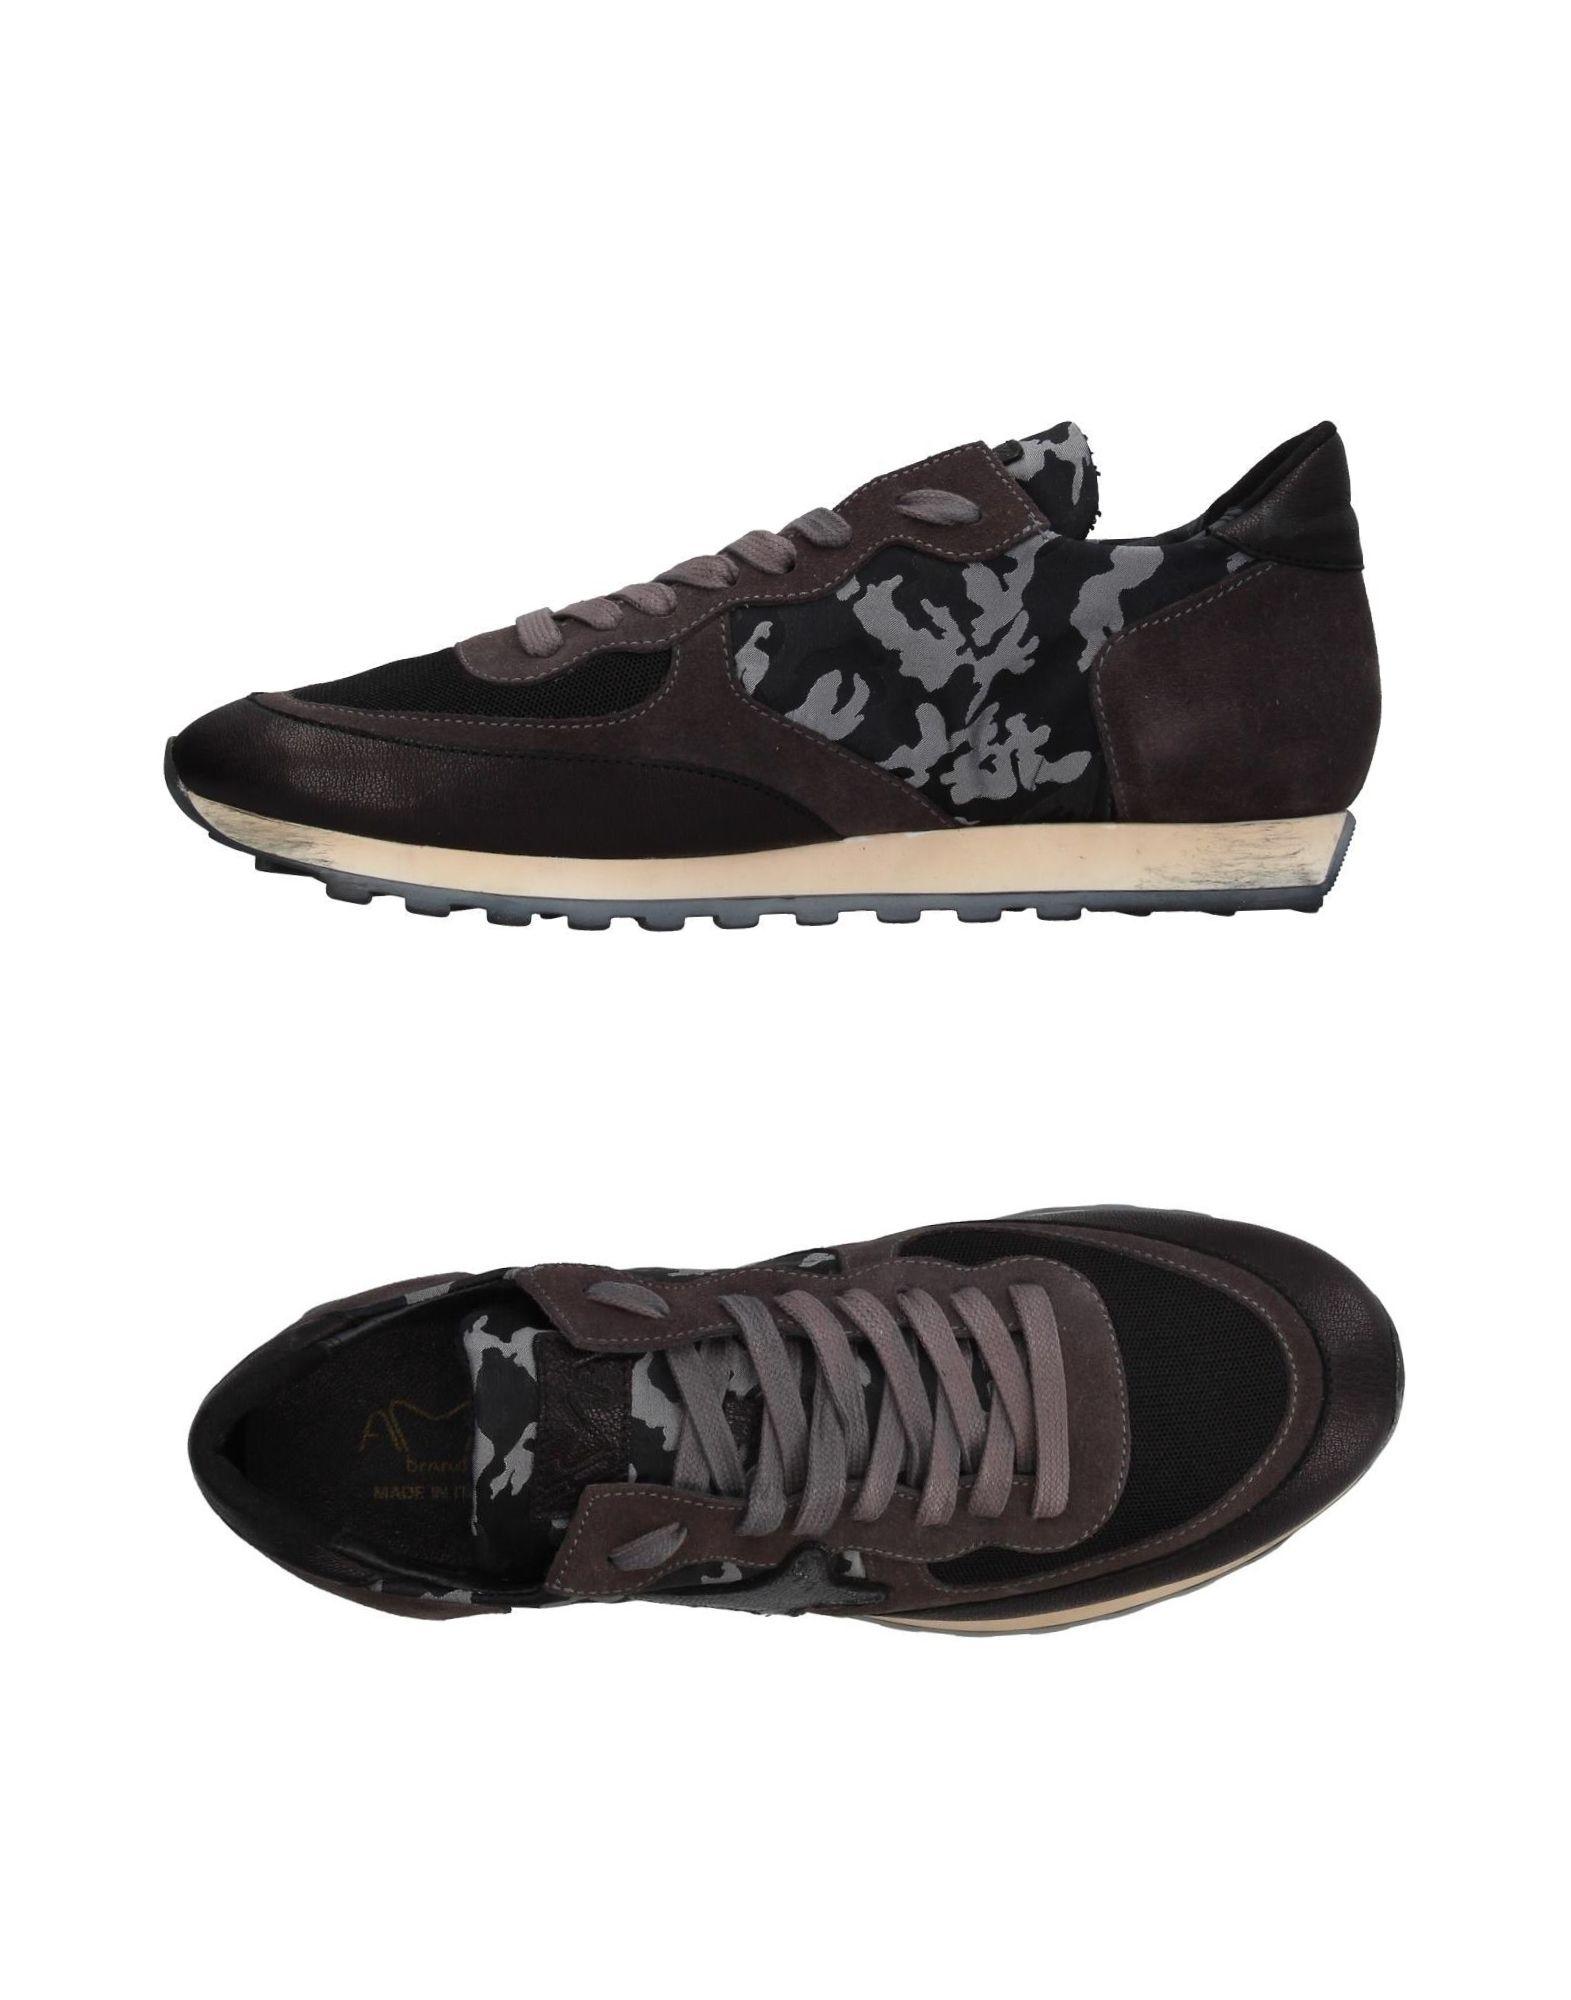 Sneakers Ama Brand Uomo - 11400824GE